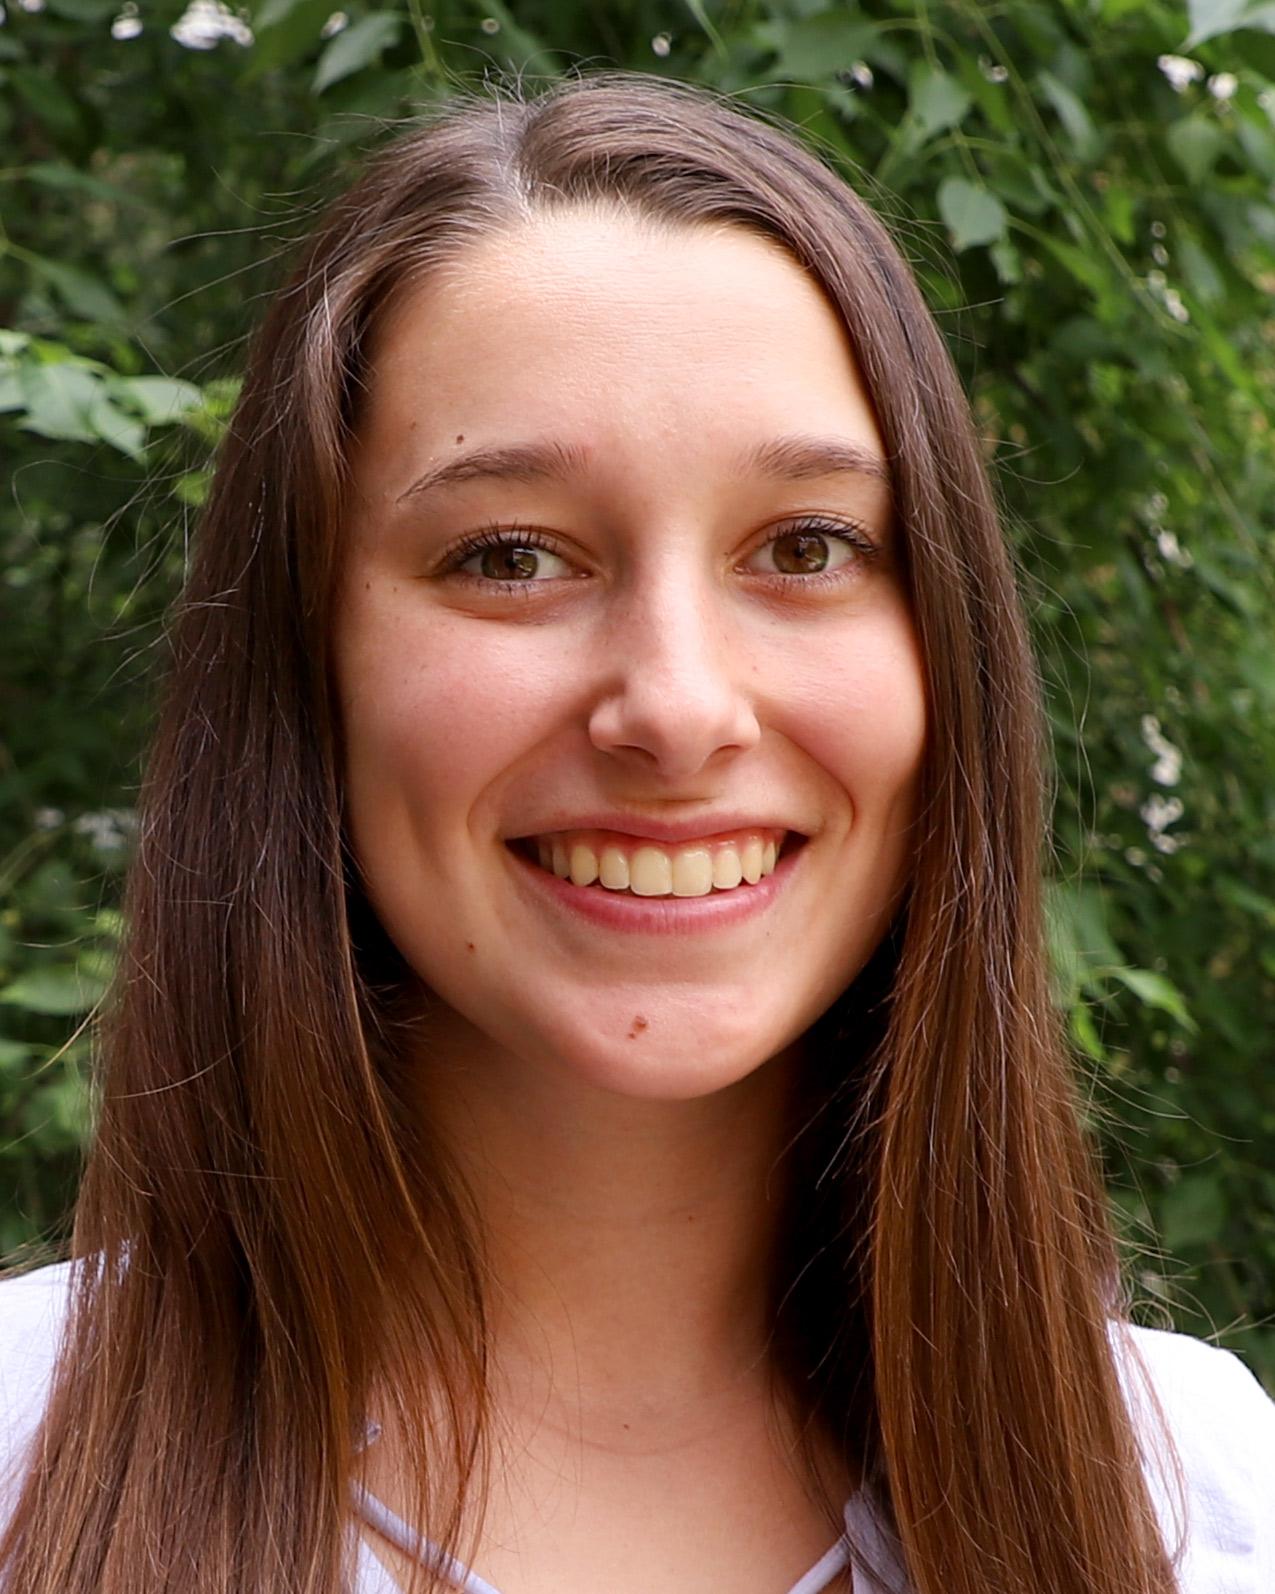 Mackenzie Zwiener